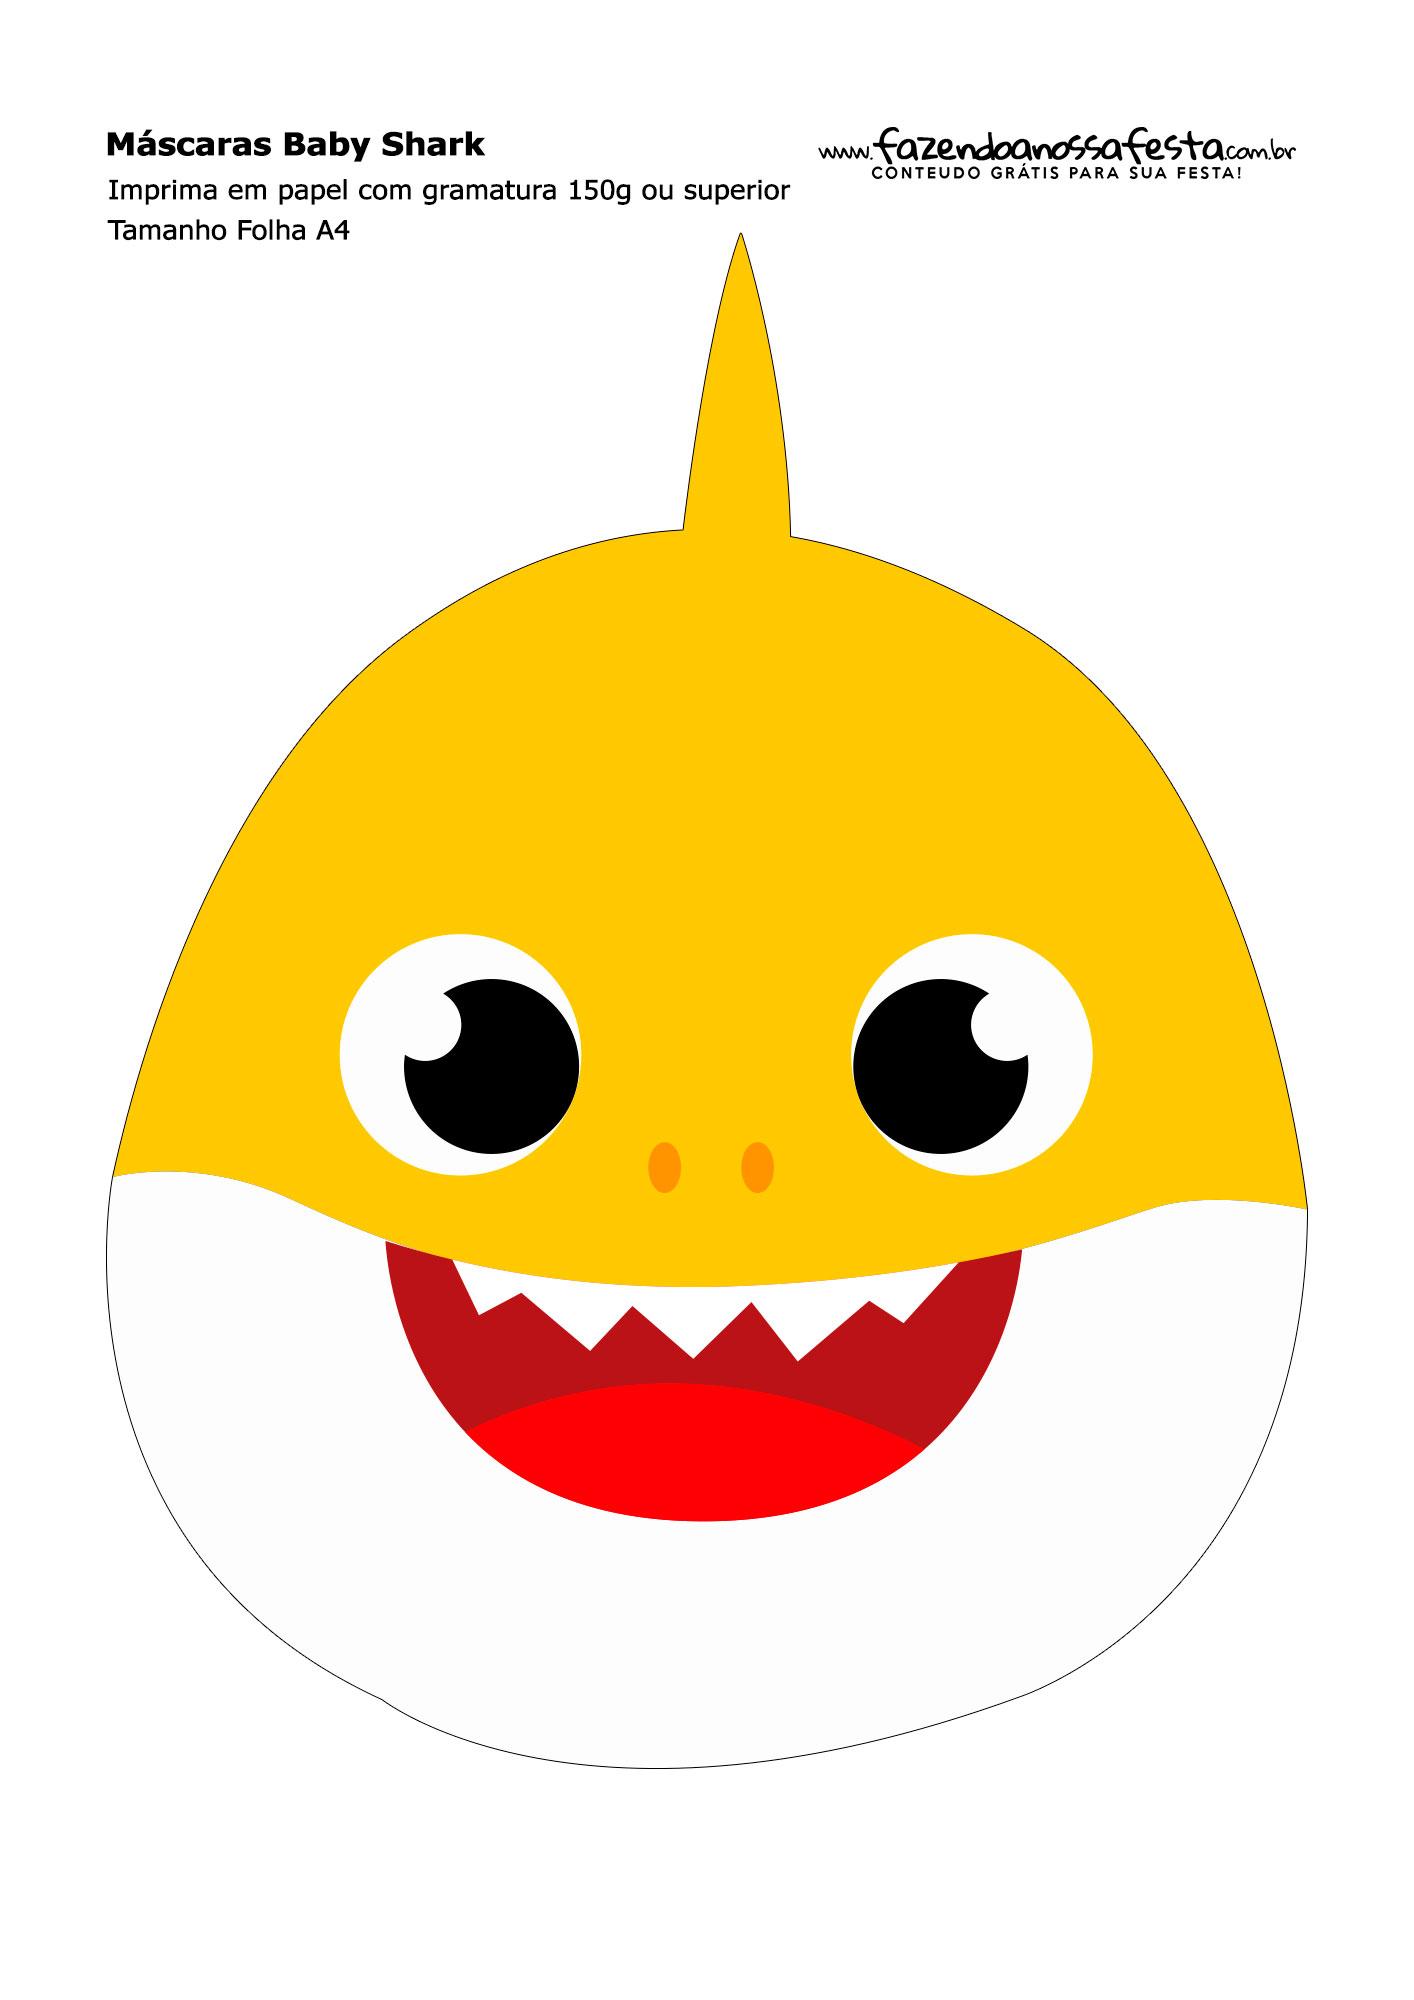 Mascaras Baby Shark